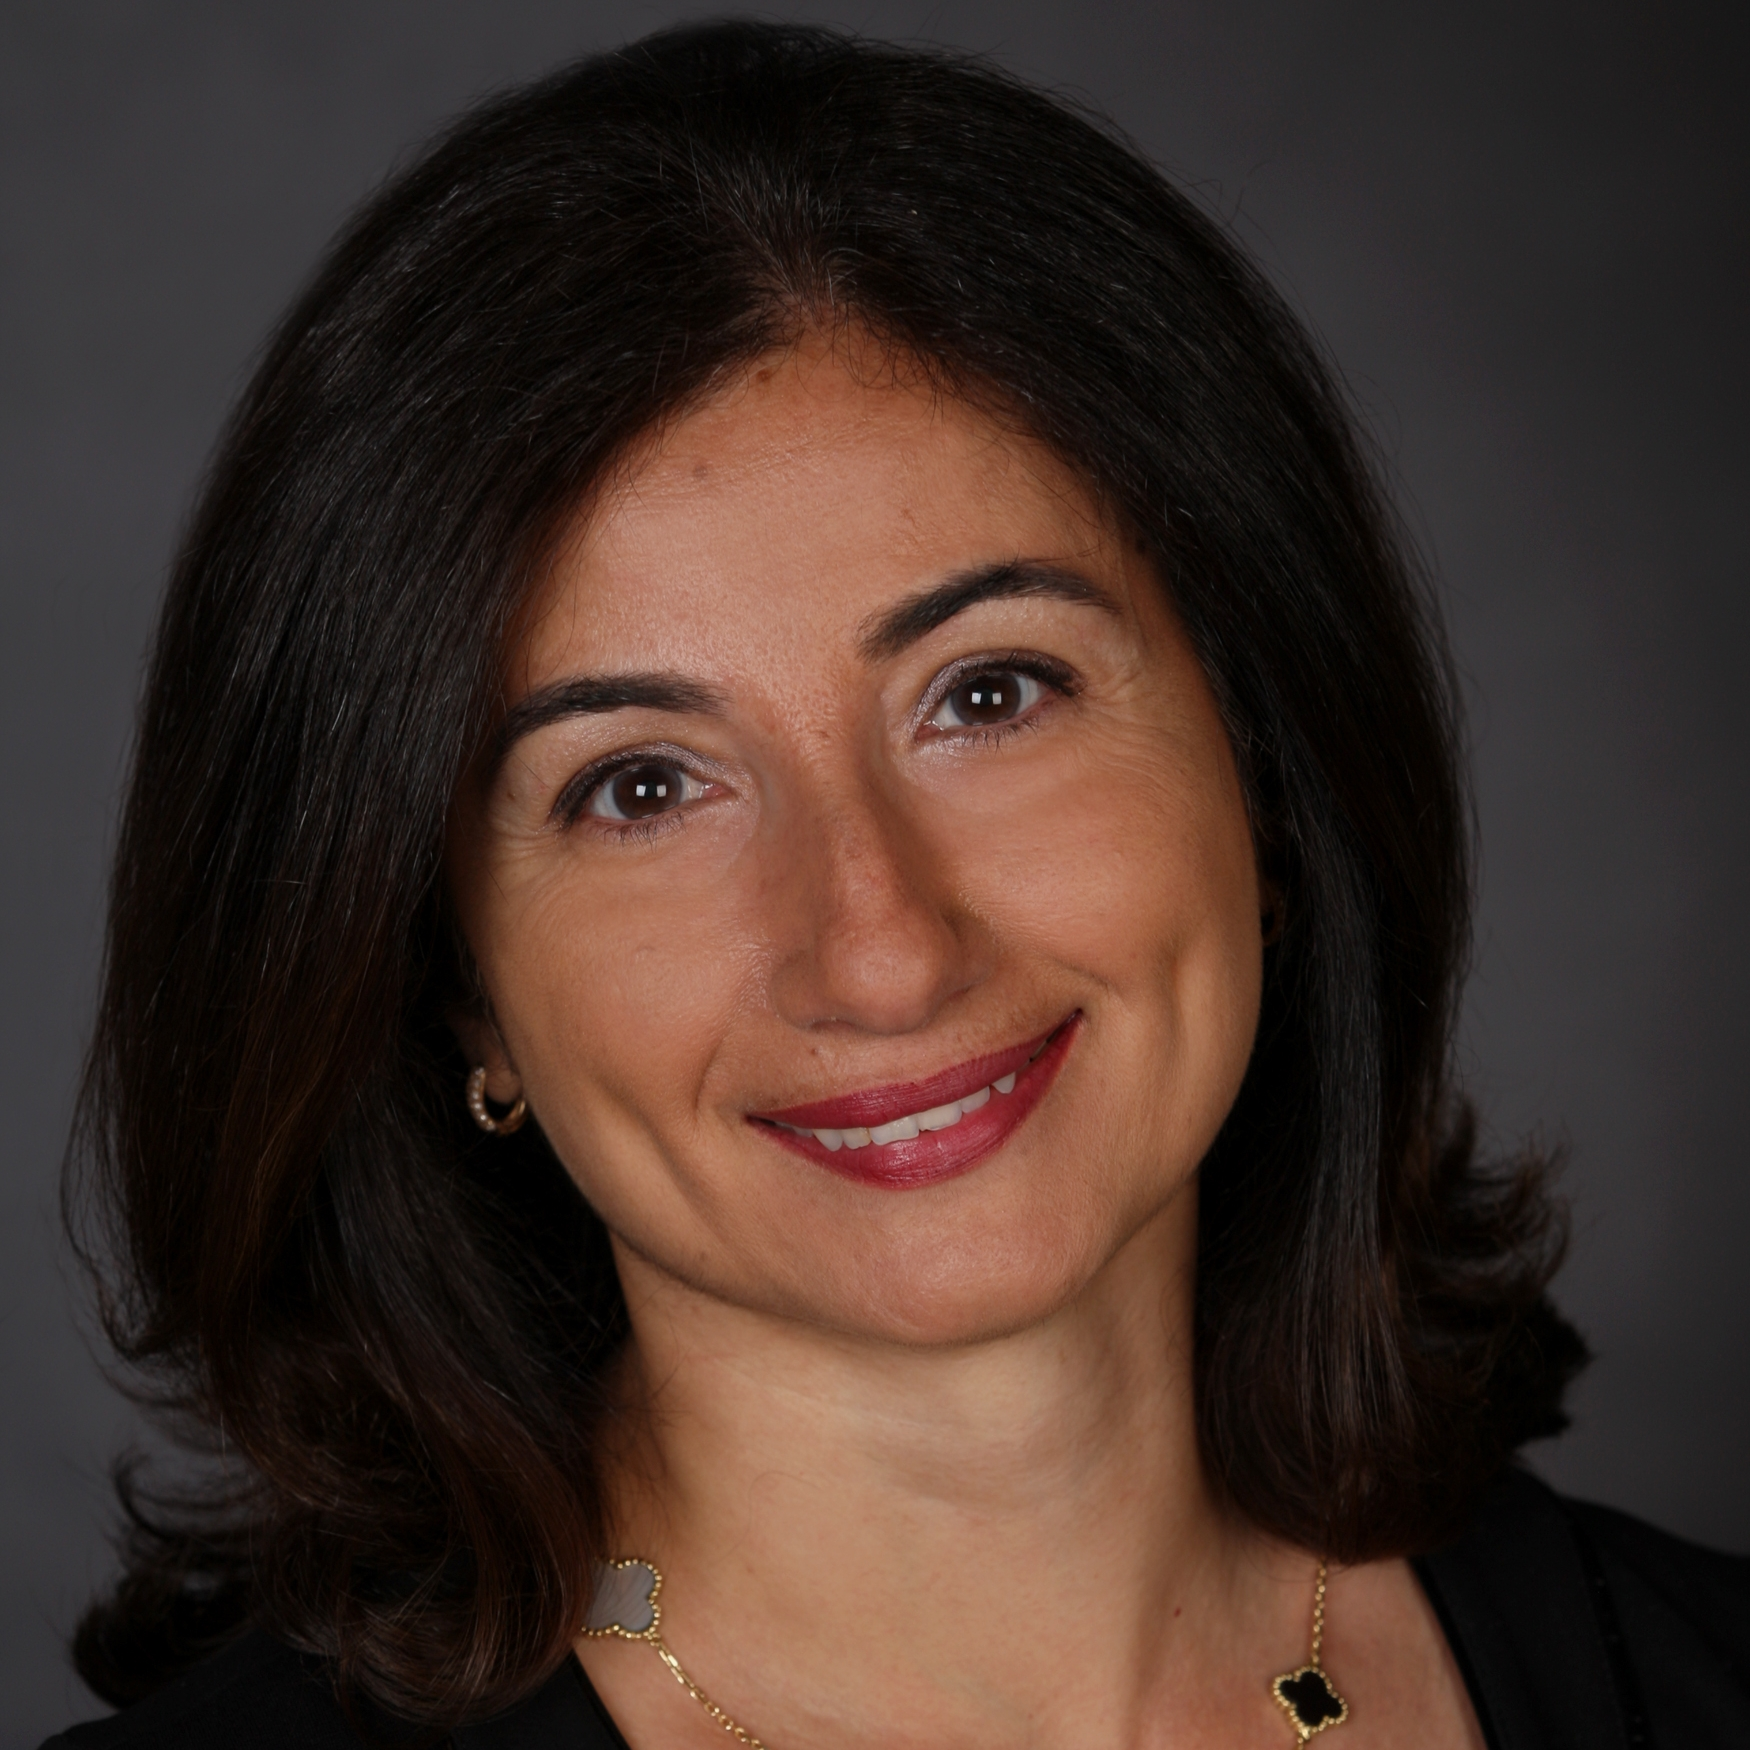 micheline Germanos - Founder and Principal at Germanos Leadership, LLC